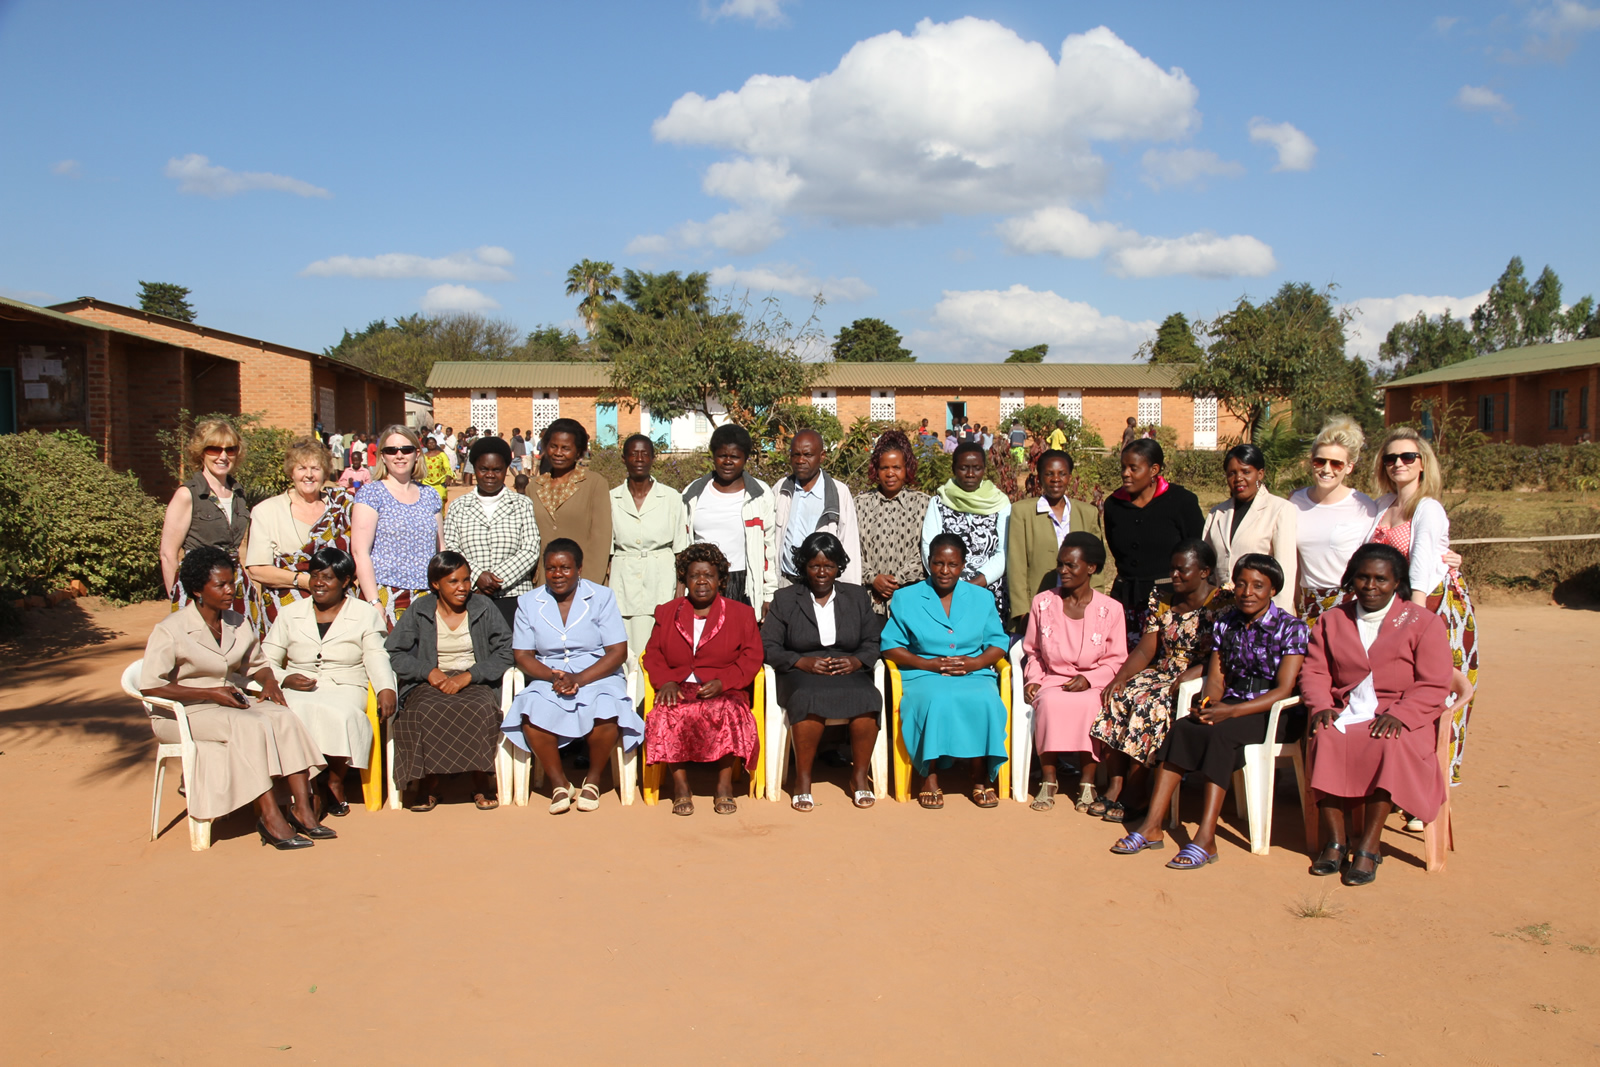 teachers in formal pose